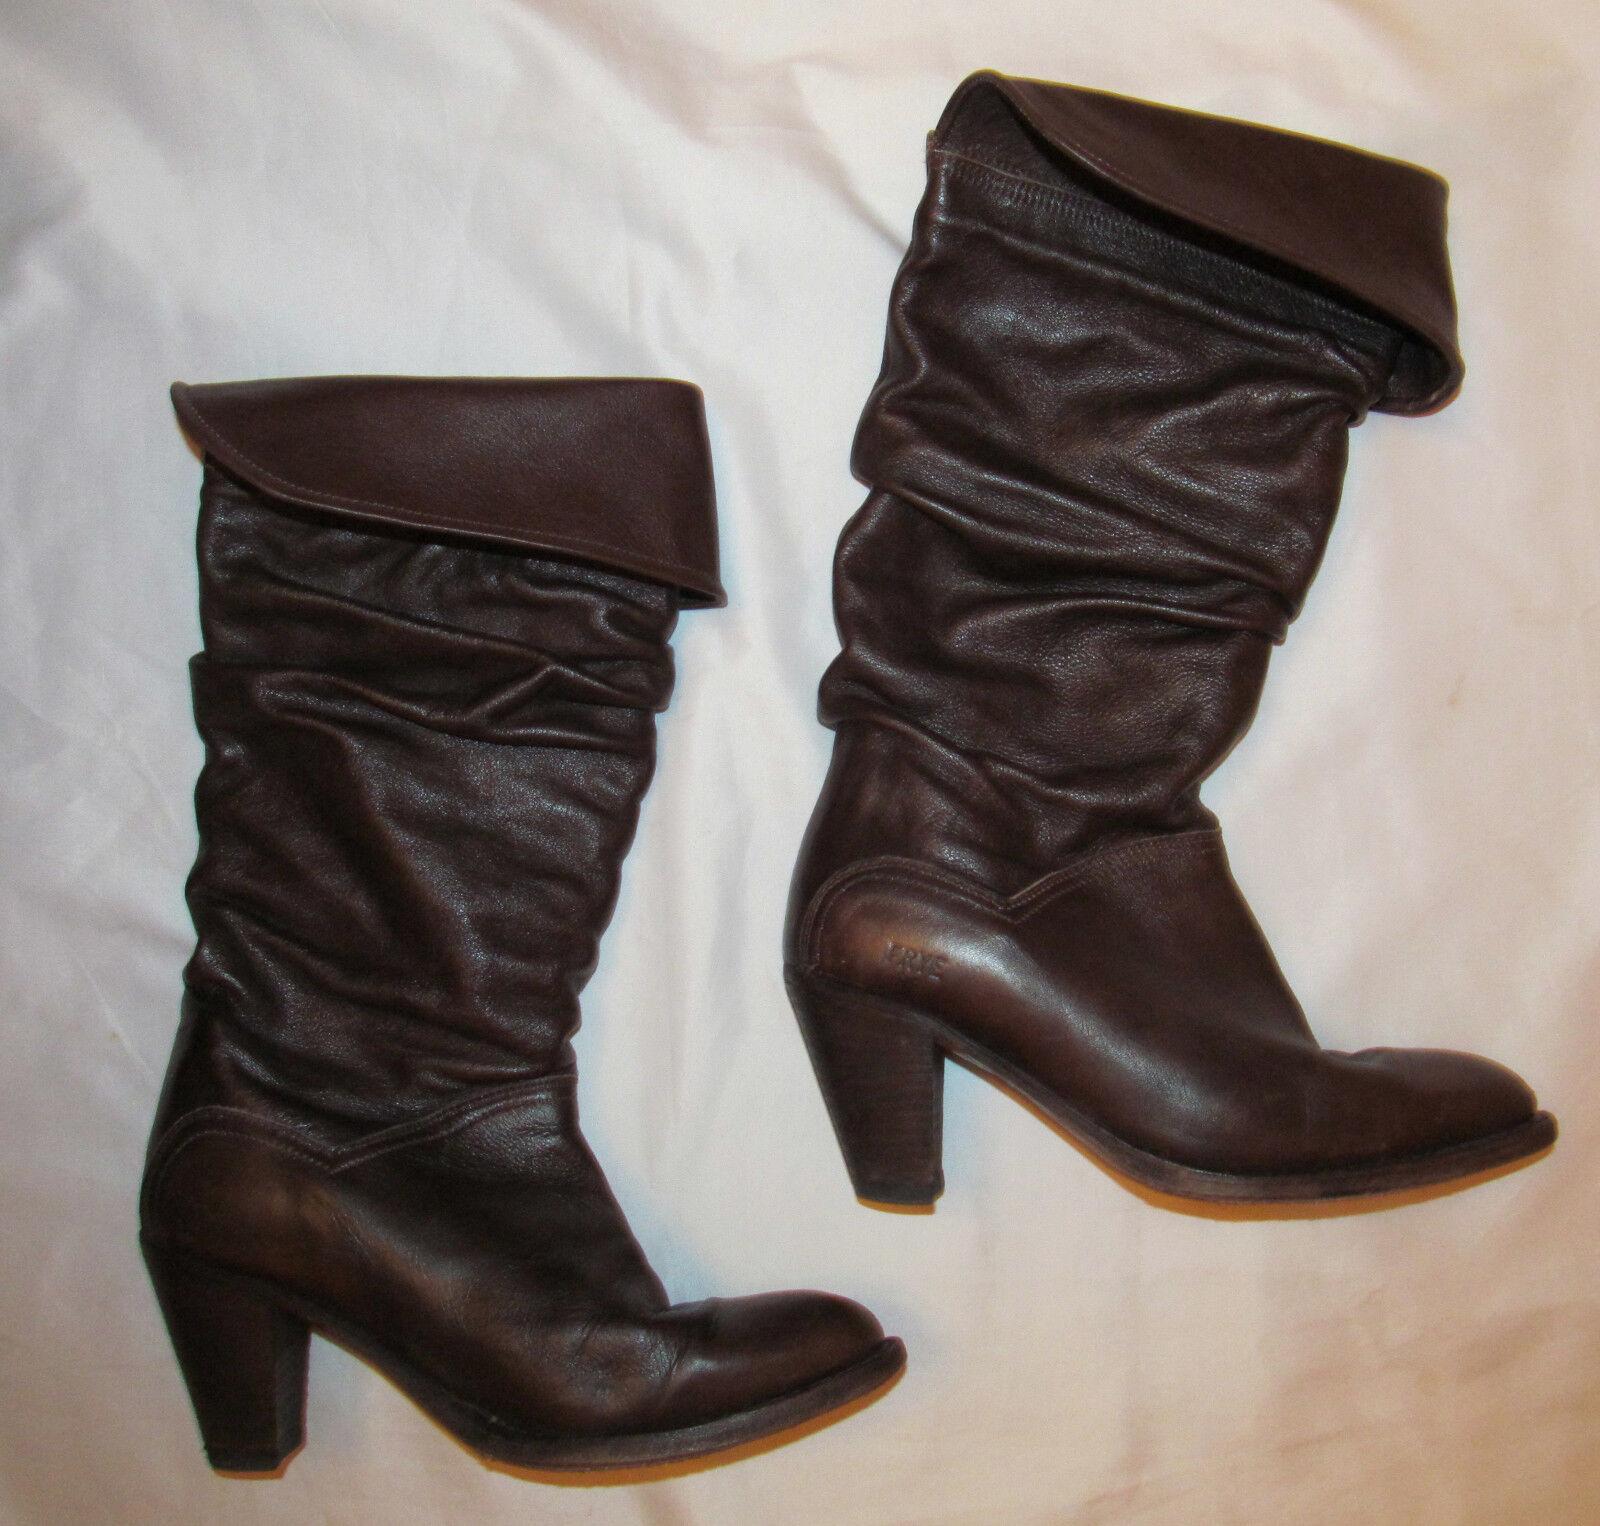 vintage FRYE DORADO slouch foldover cuffed pull on Braun heeled boots 7.5 M